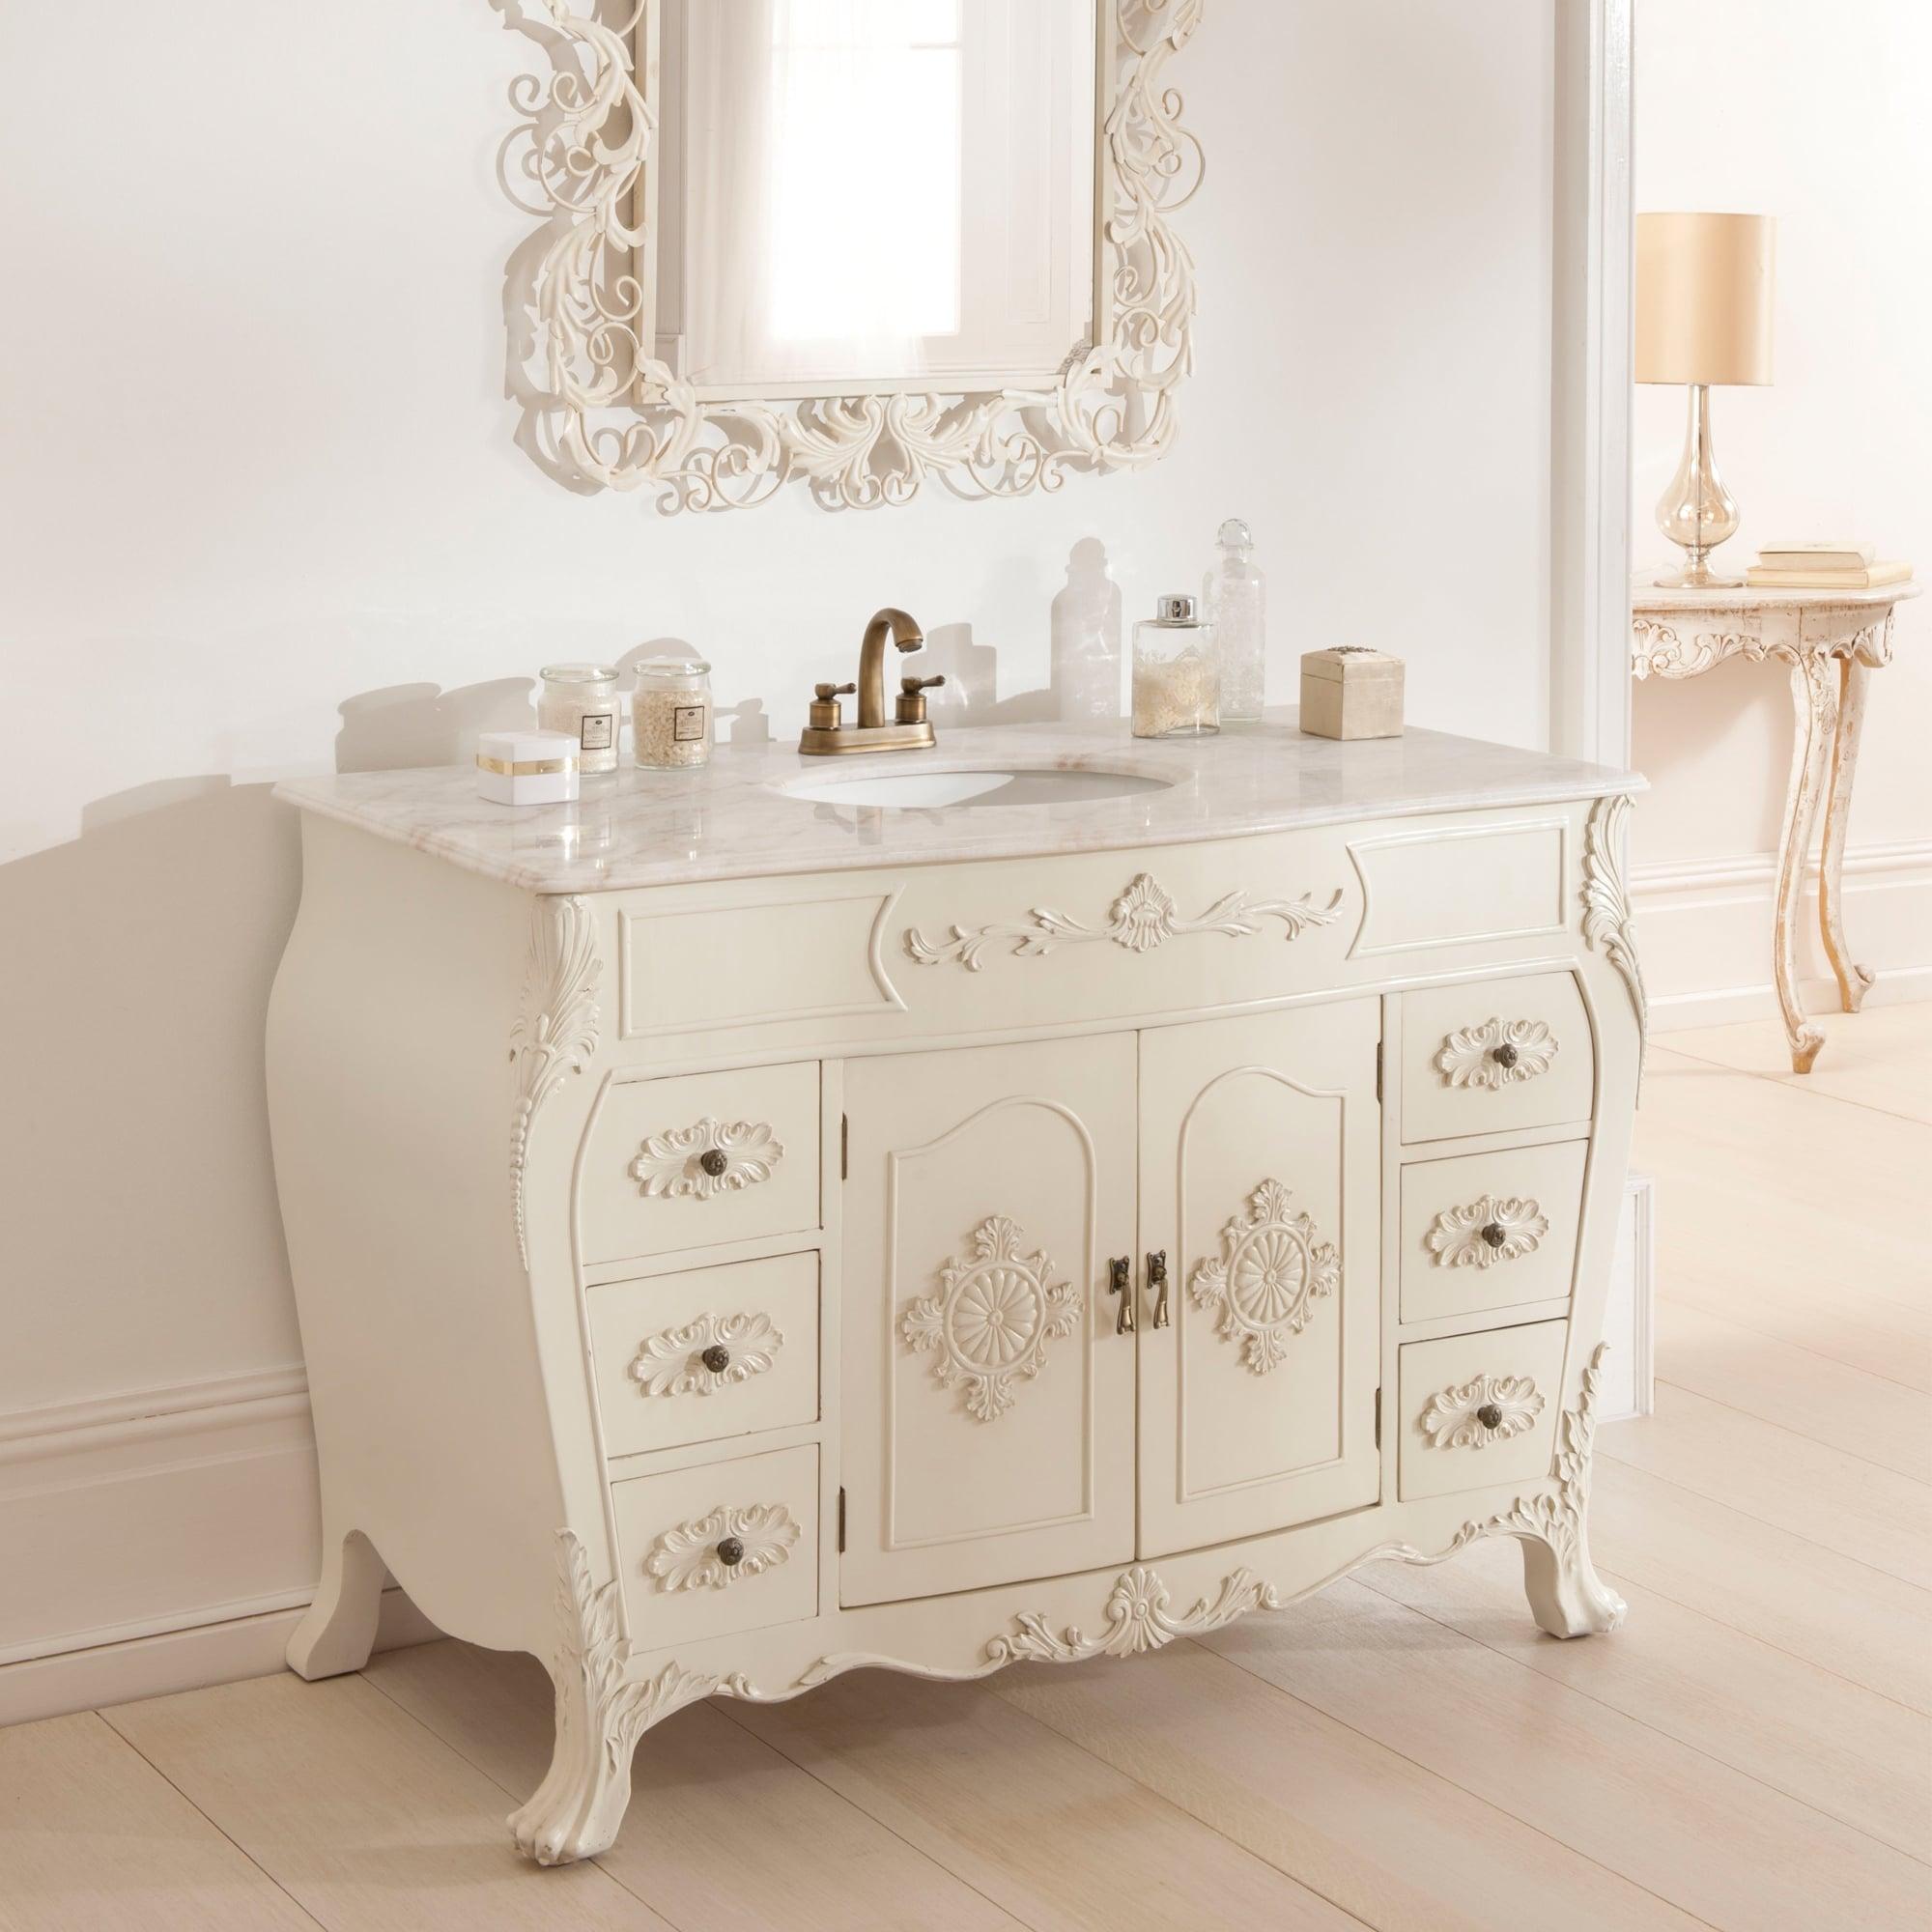 Antique French Vanity Unit Shab Chic Bathroom Furniture regarding sizing 2000 X 2000